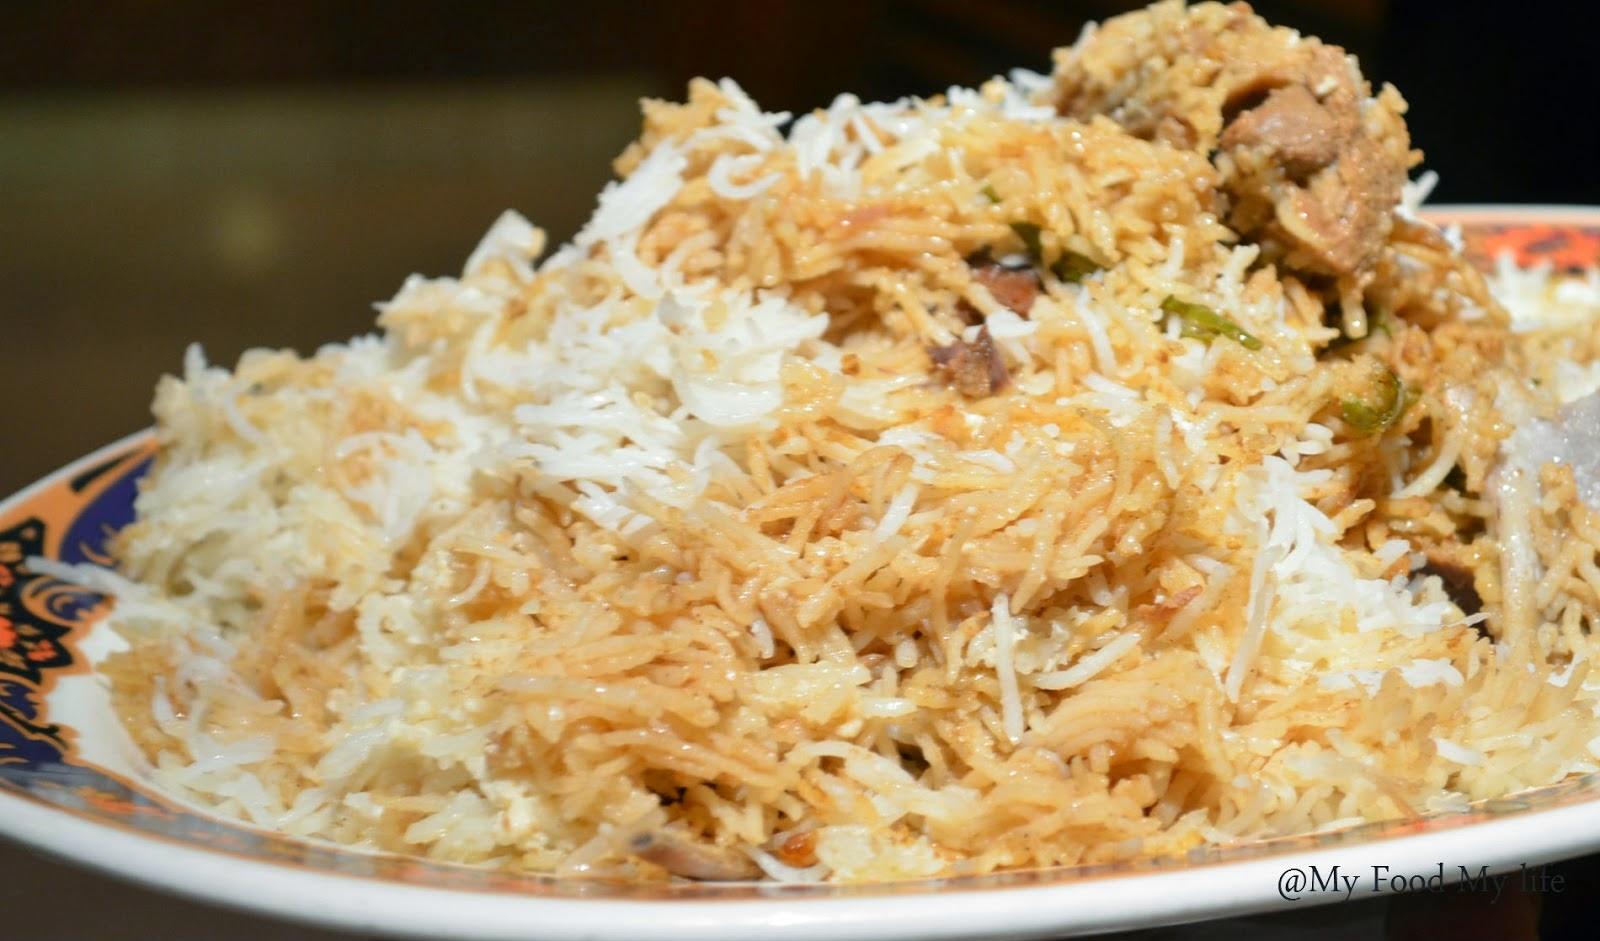 Kolkata food bloggers royal repast its sonar a date for Awadhi cuisine kolkata